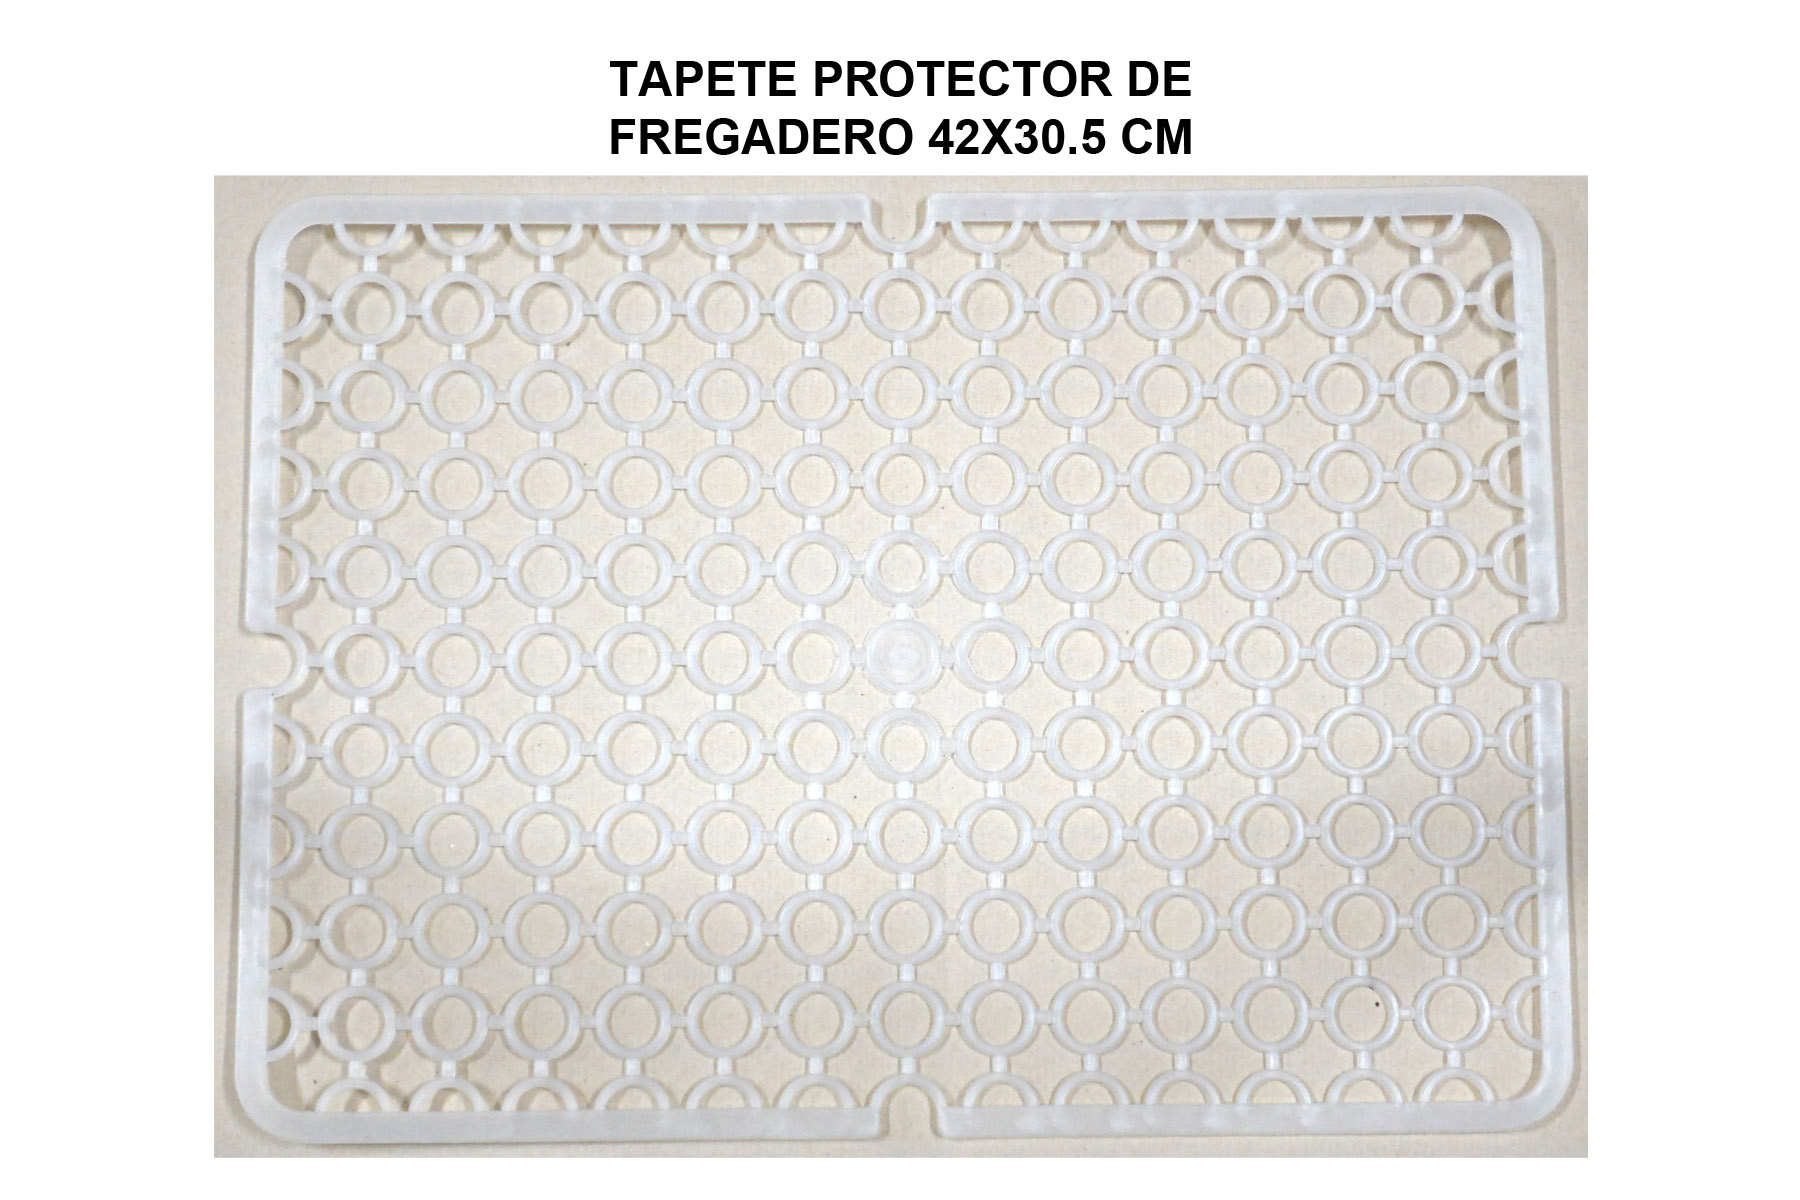 TAPETE PROTECTOR FREGADERO 42X30.5 CM